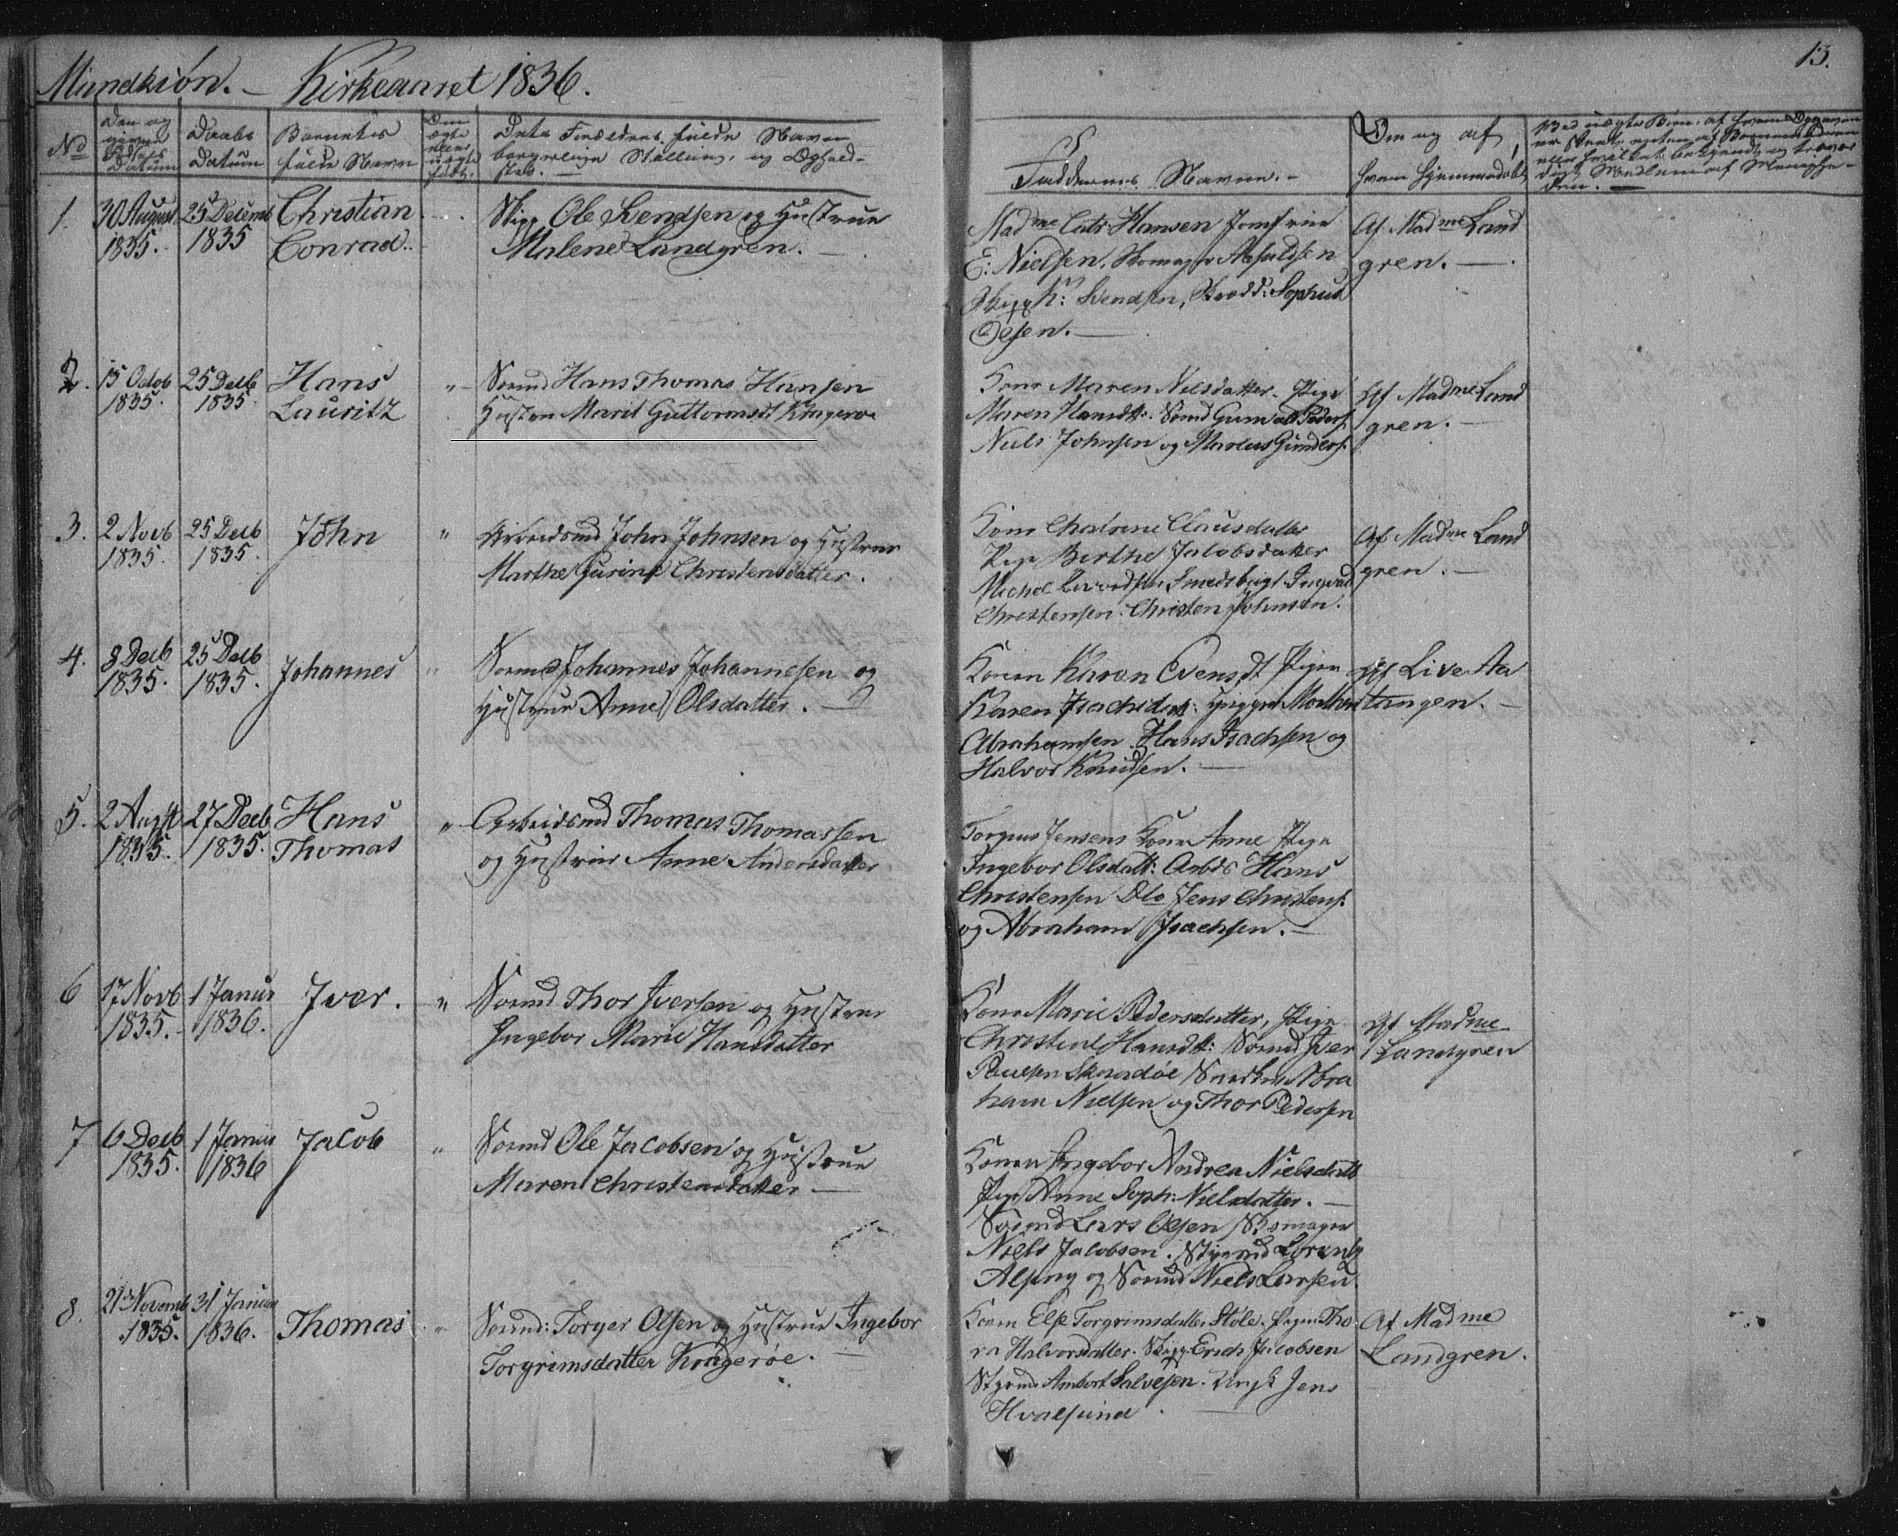 SAKO, Kragerø kirkebøker, F/Fa/L0005: Ministerialbok nr. 5, 1832-1847, s. 13